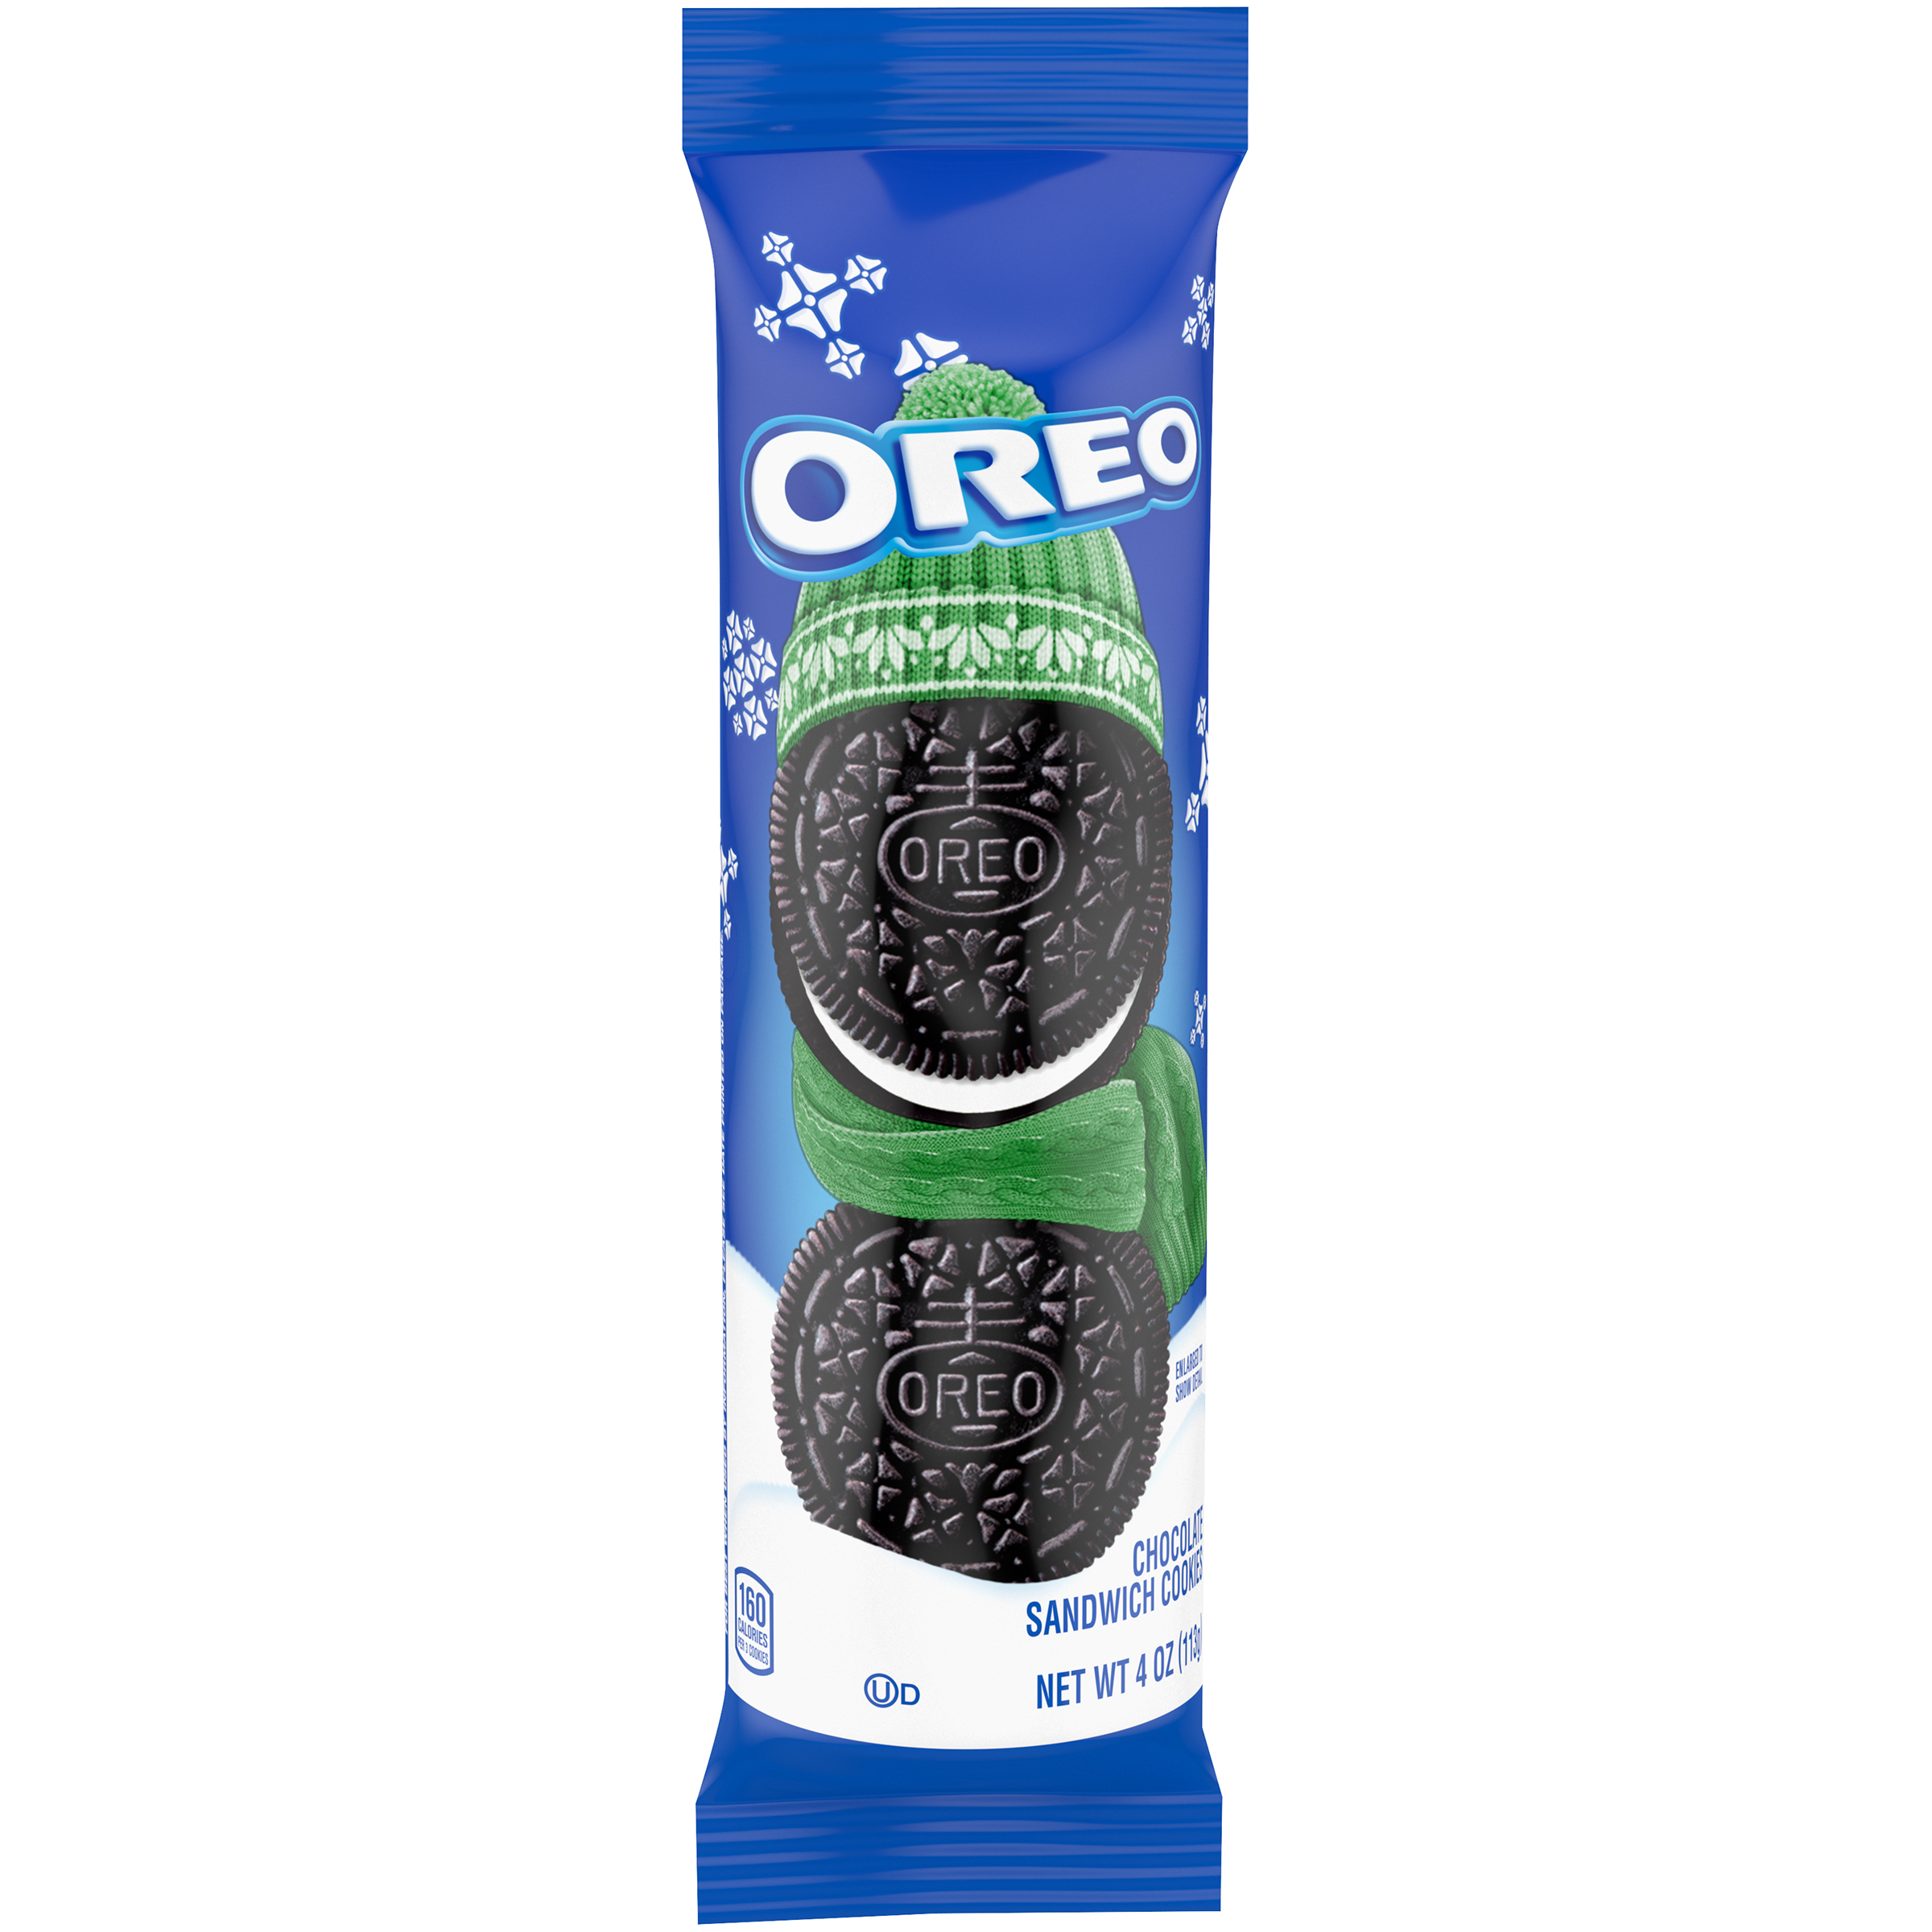 OREO Original Cookies 4 oz